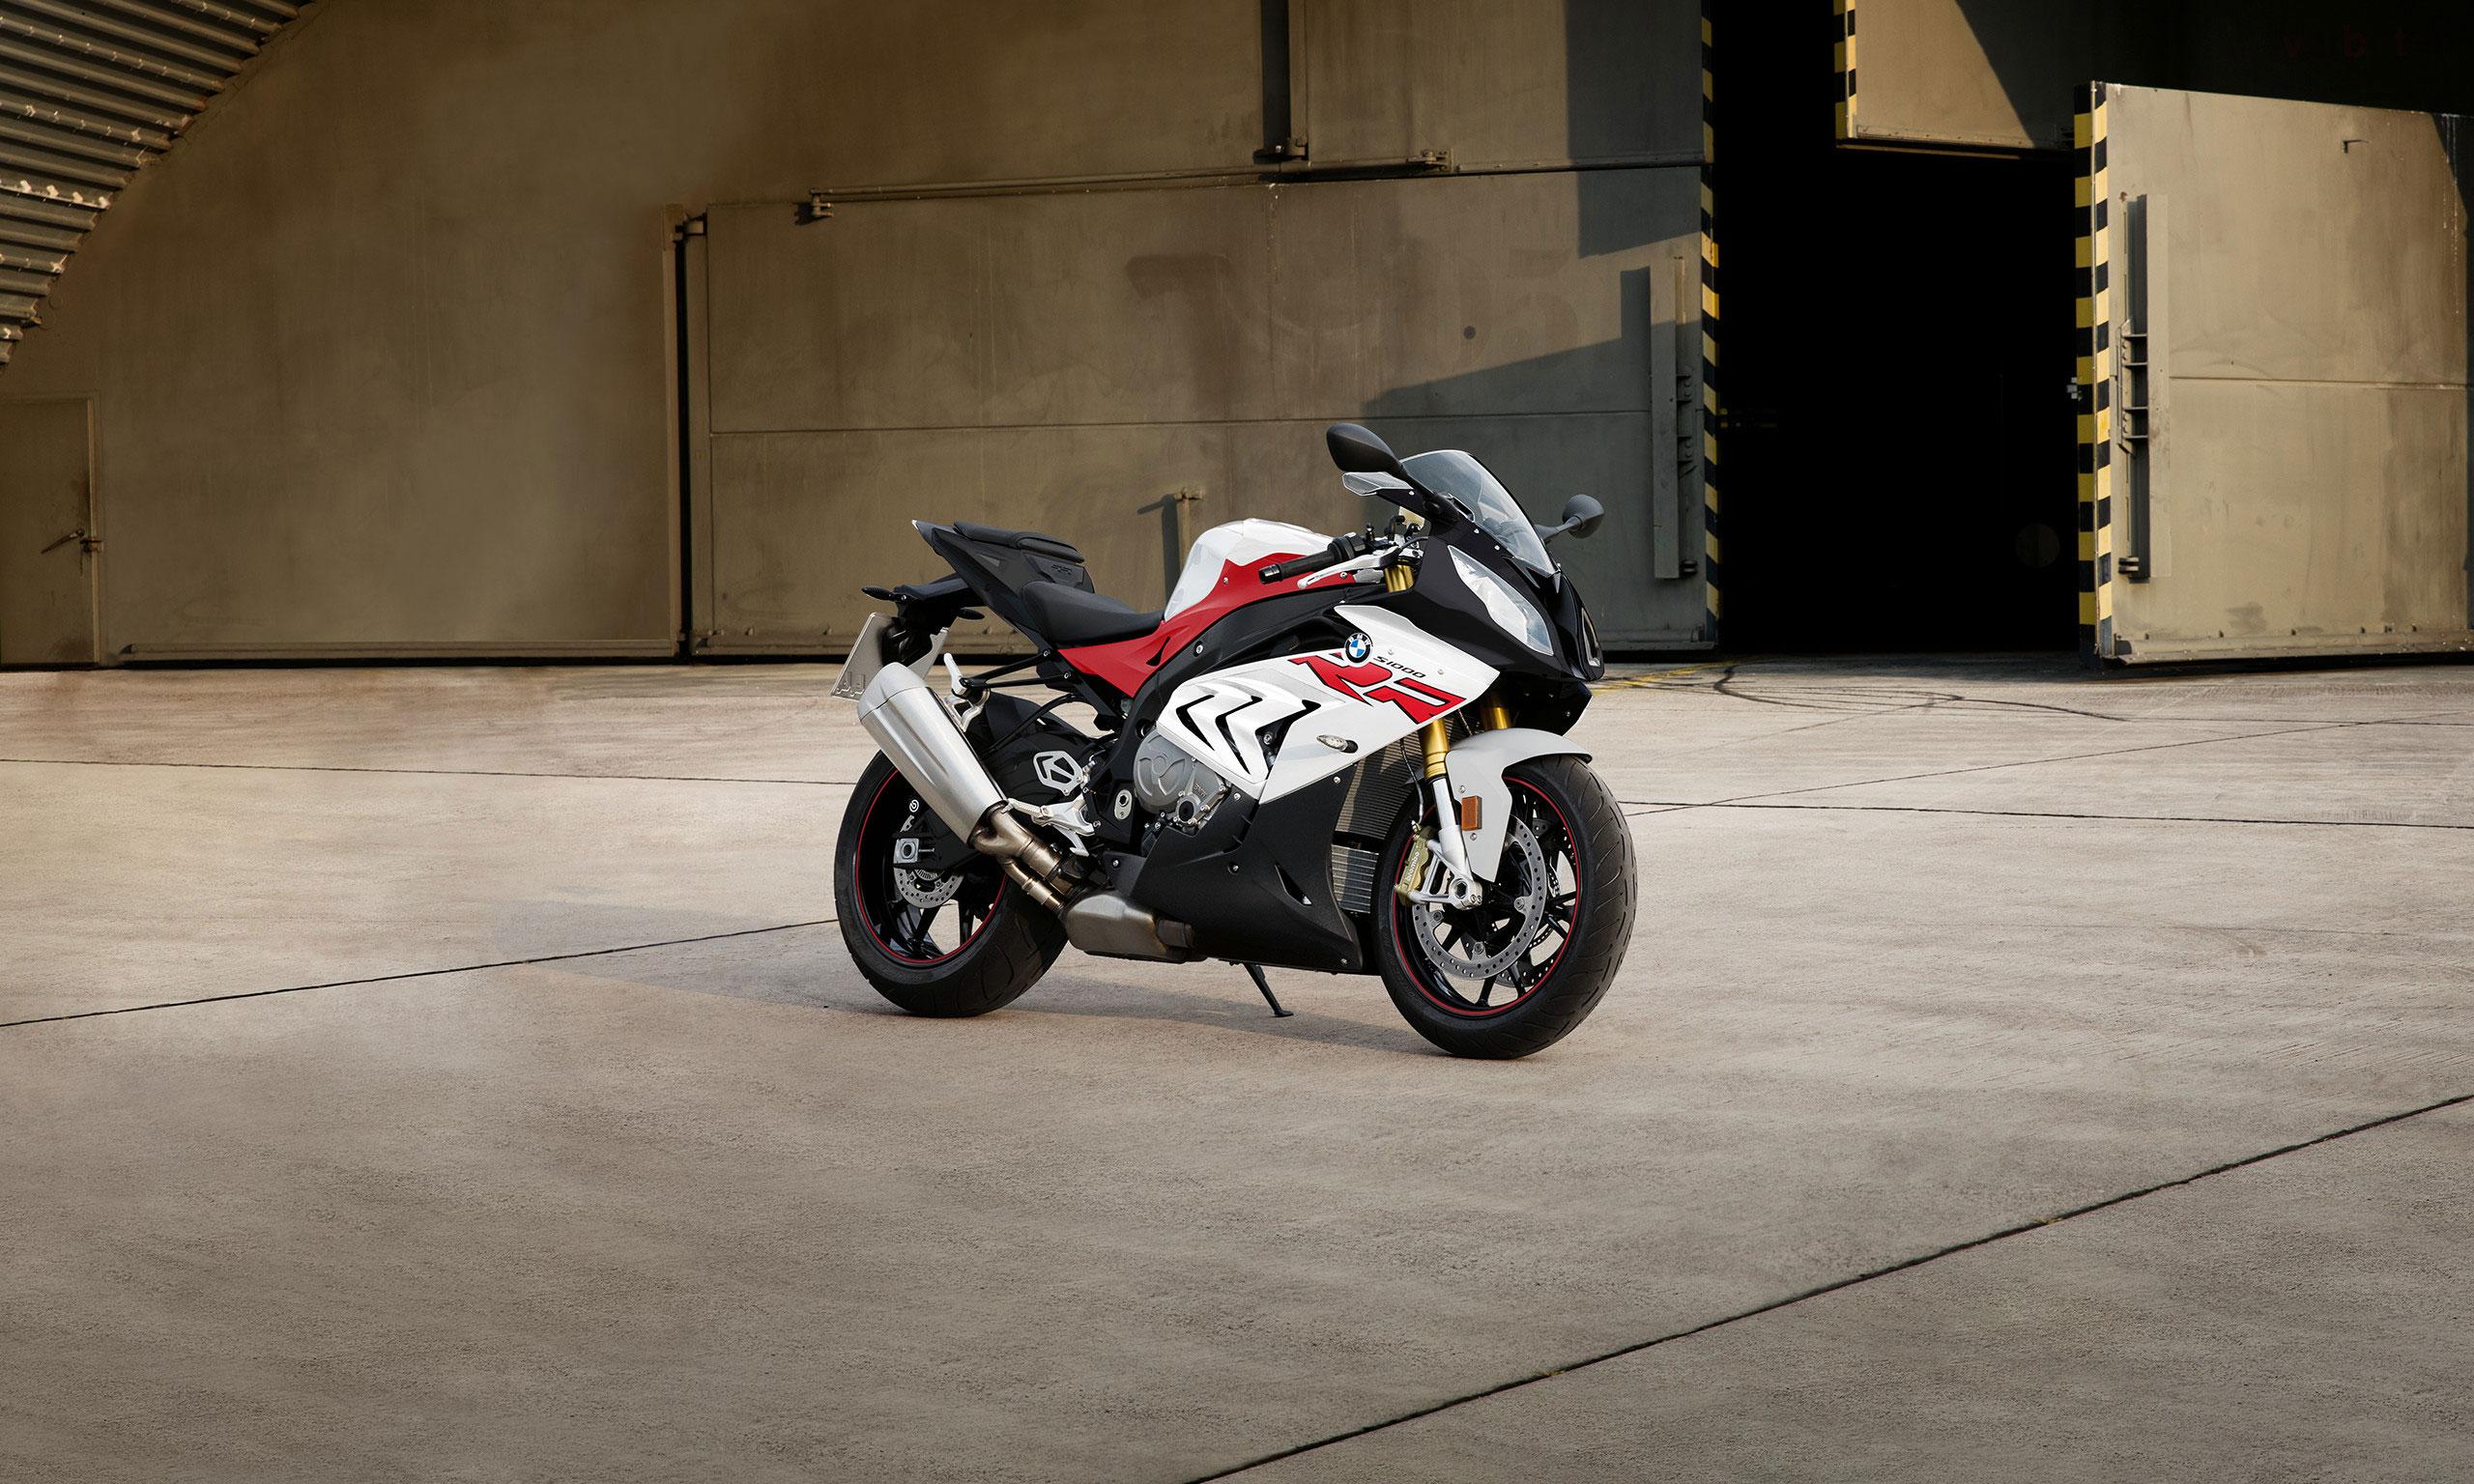 Bmw S1000rr For Sale >> S 1000 RR | BMW Motorrad